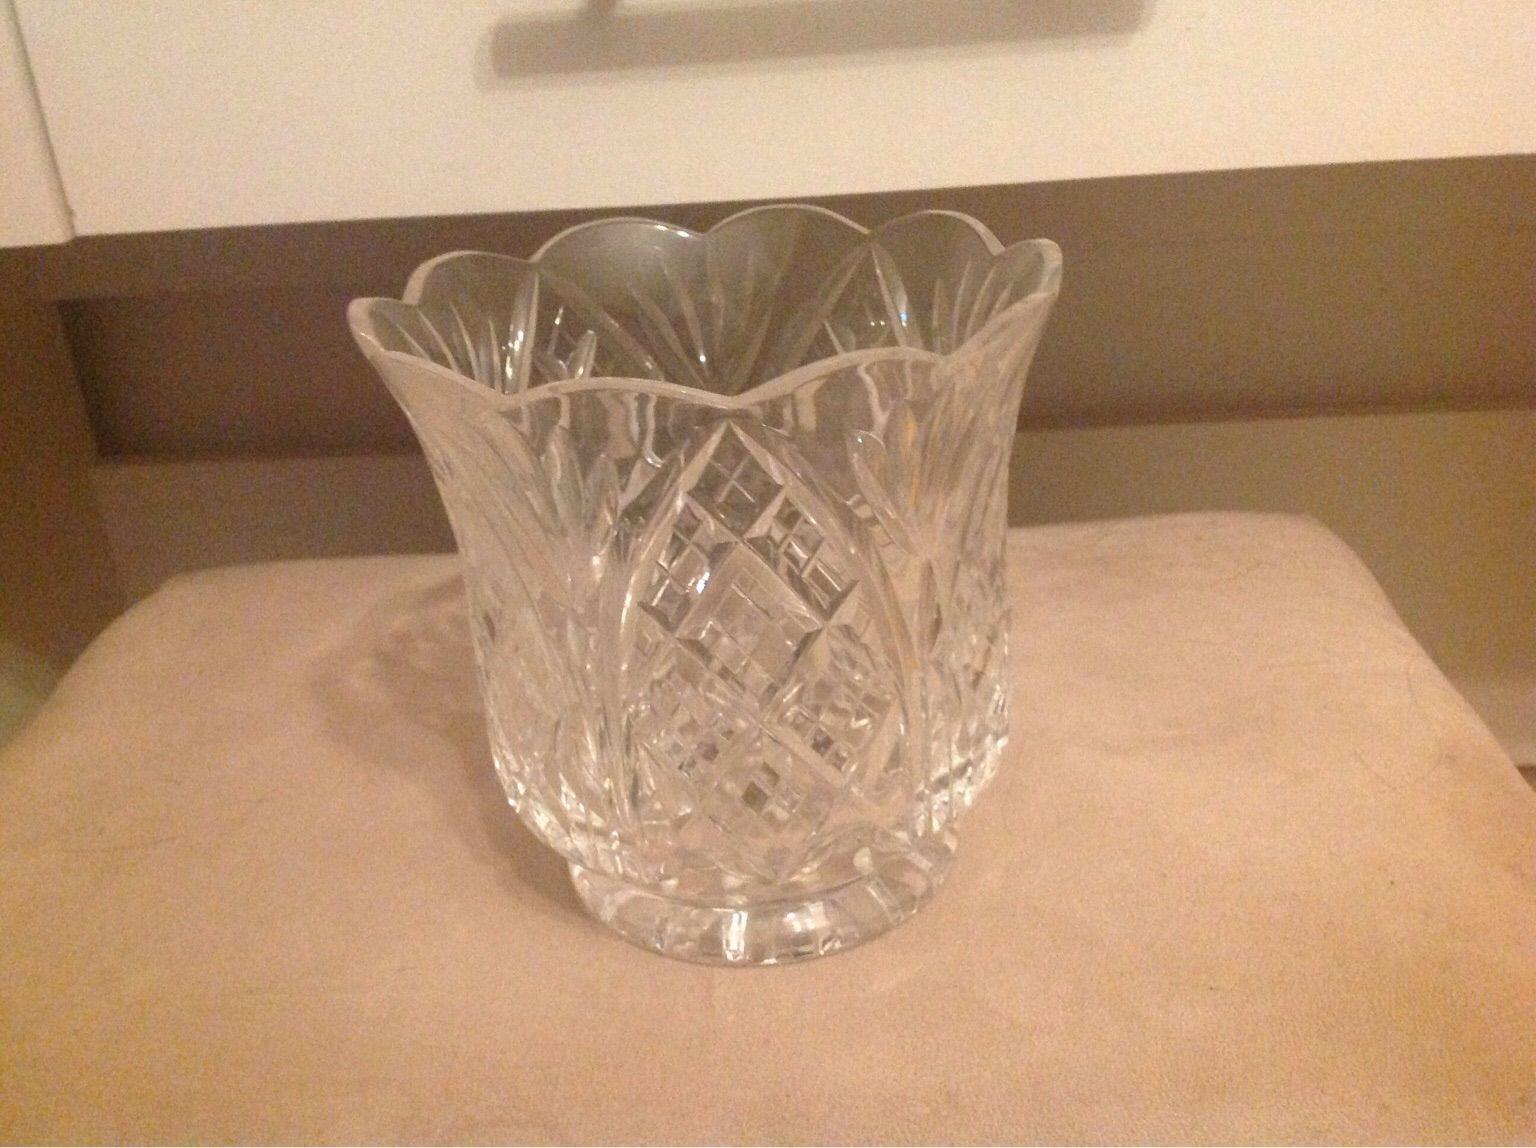 waterford crystal vase price of https en shpock com i wmucfctt7rd3b1cr 2018 10 10t015529 in waterford crystal vase 20af0c92